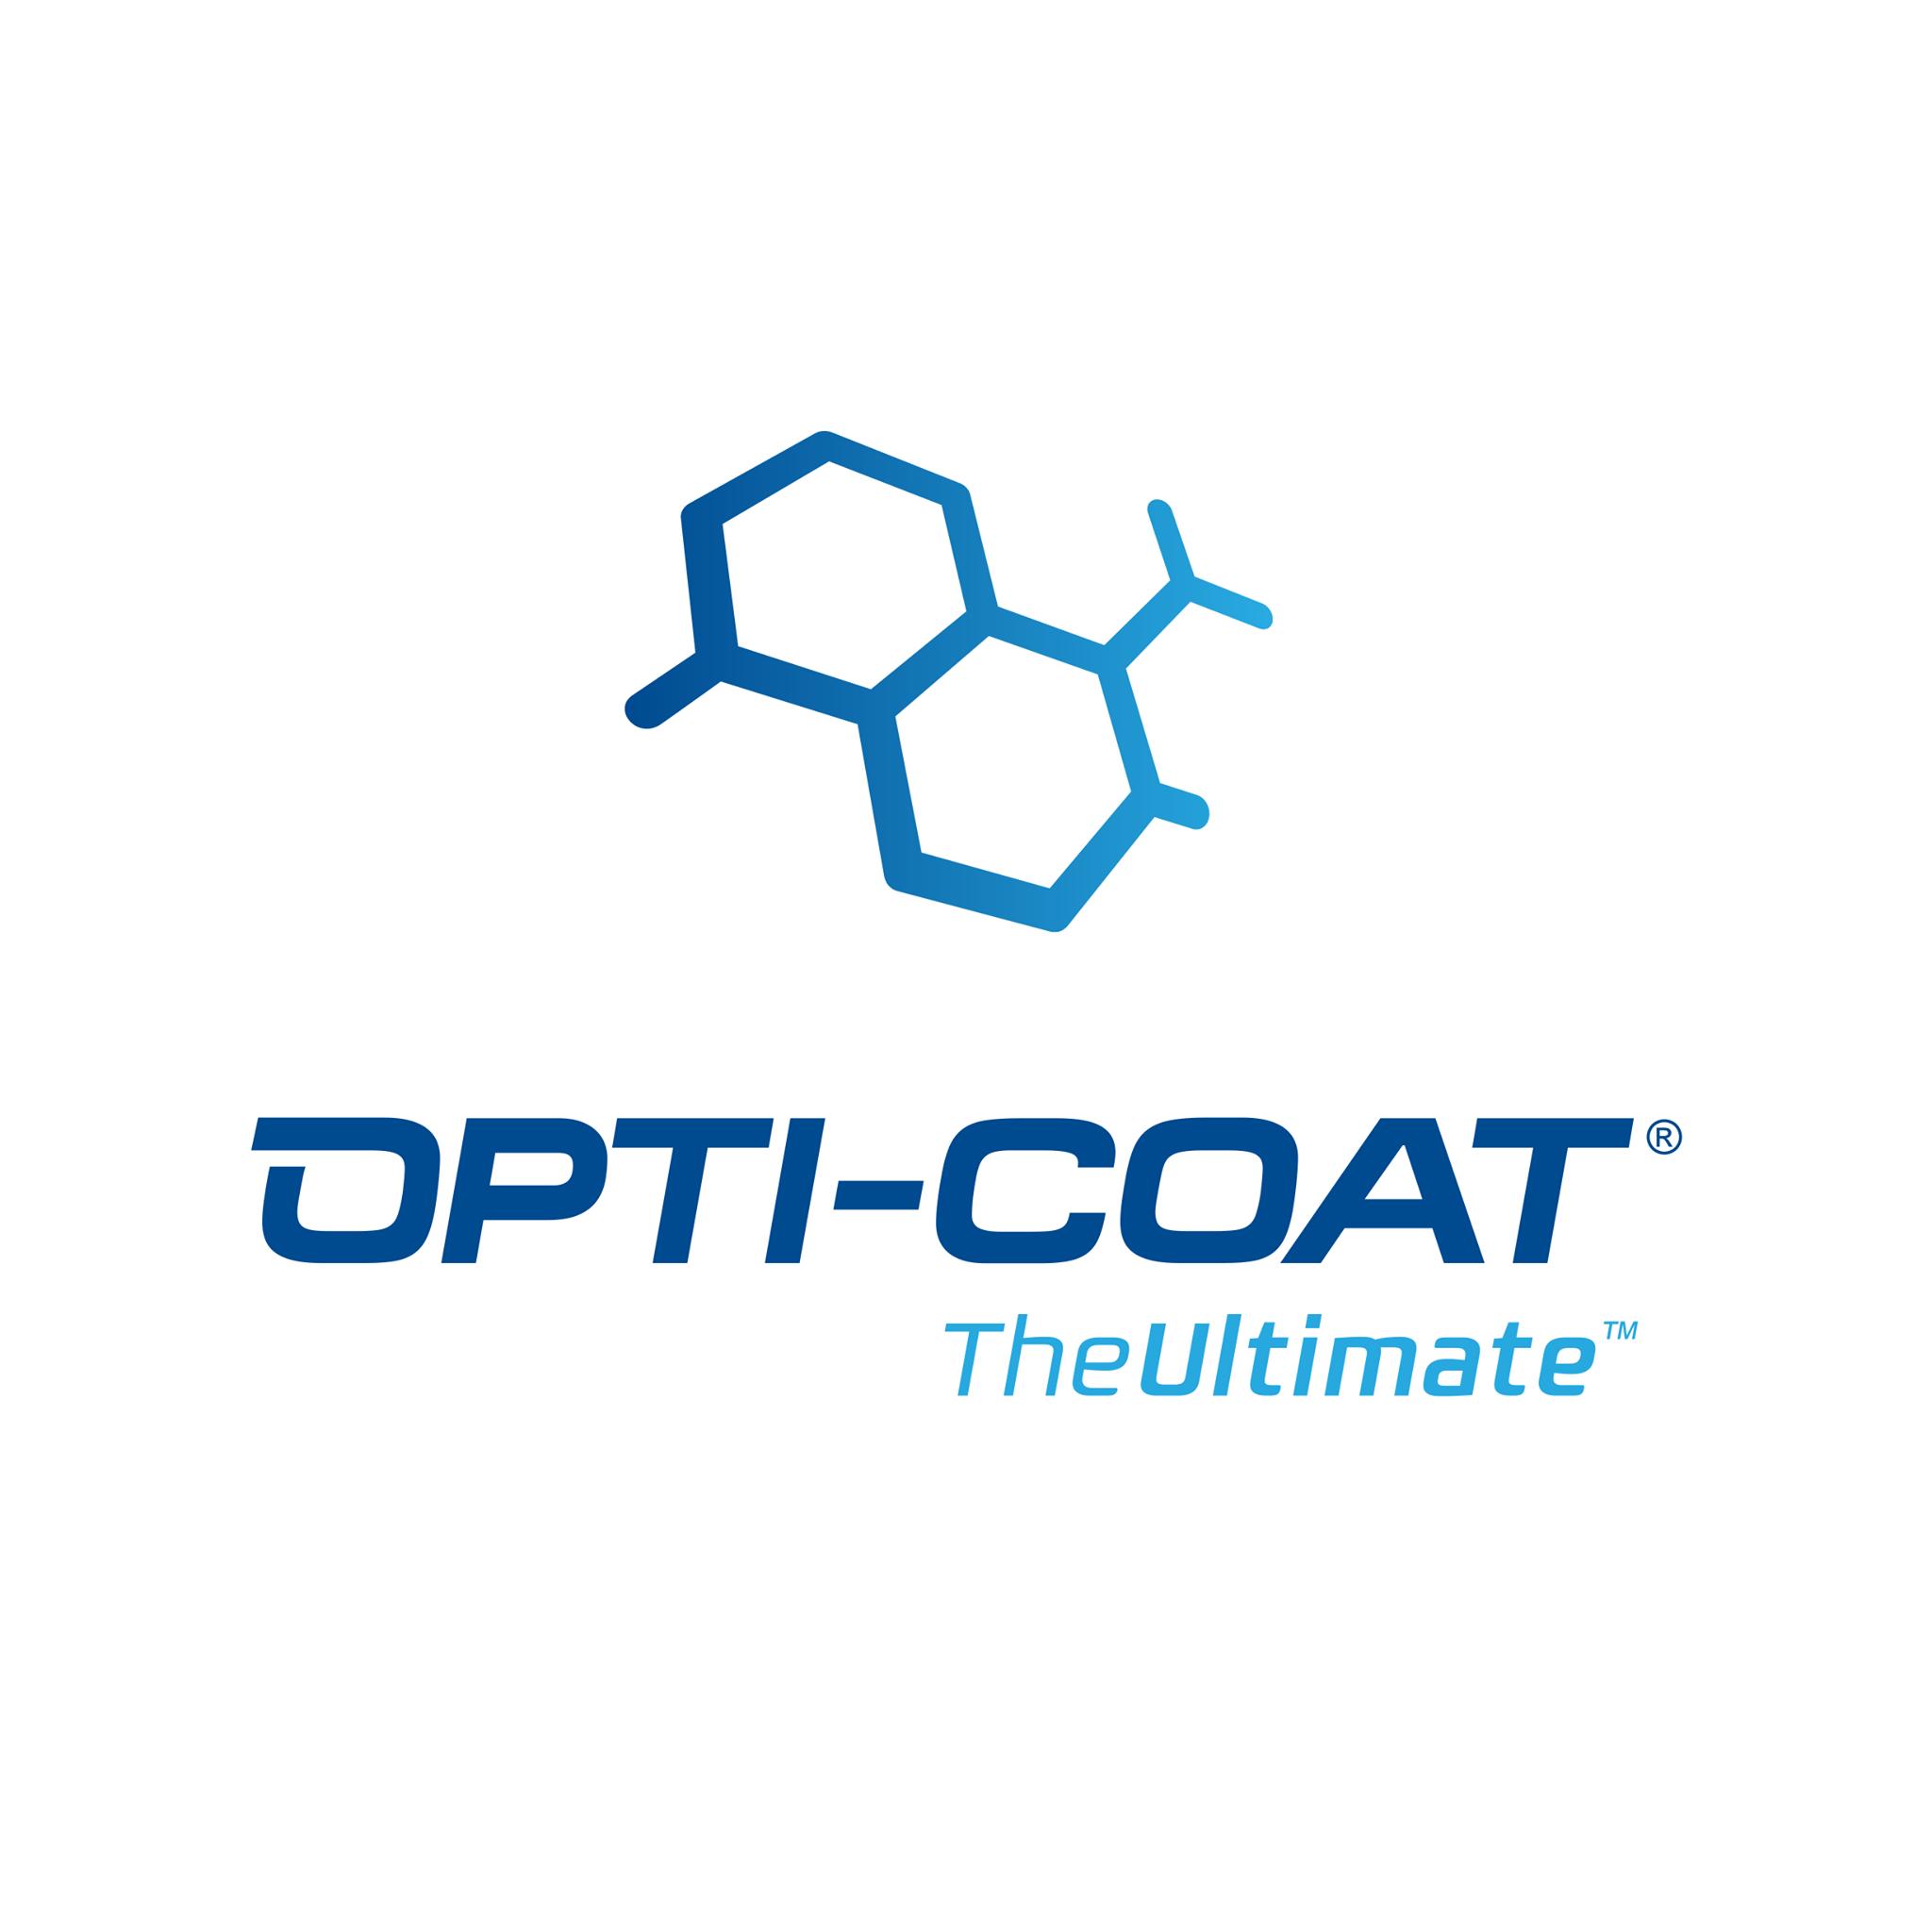 Opti-Coat